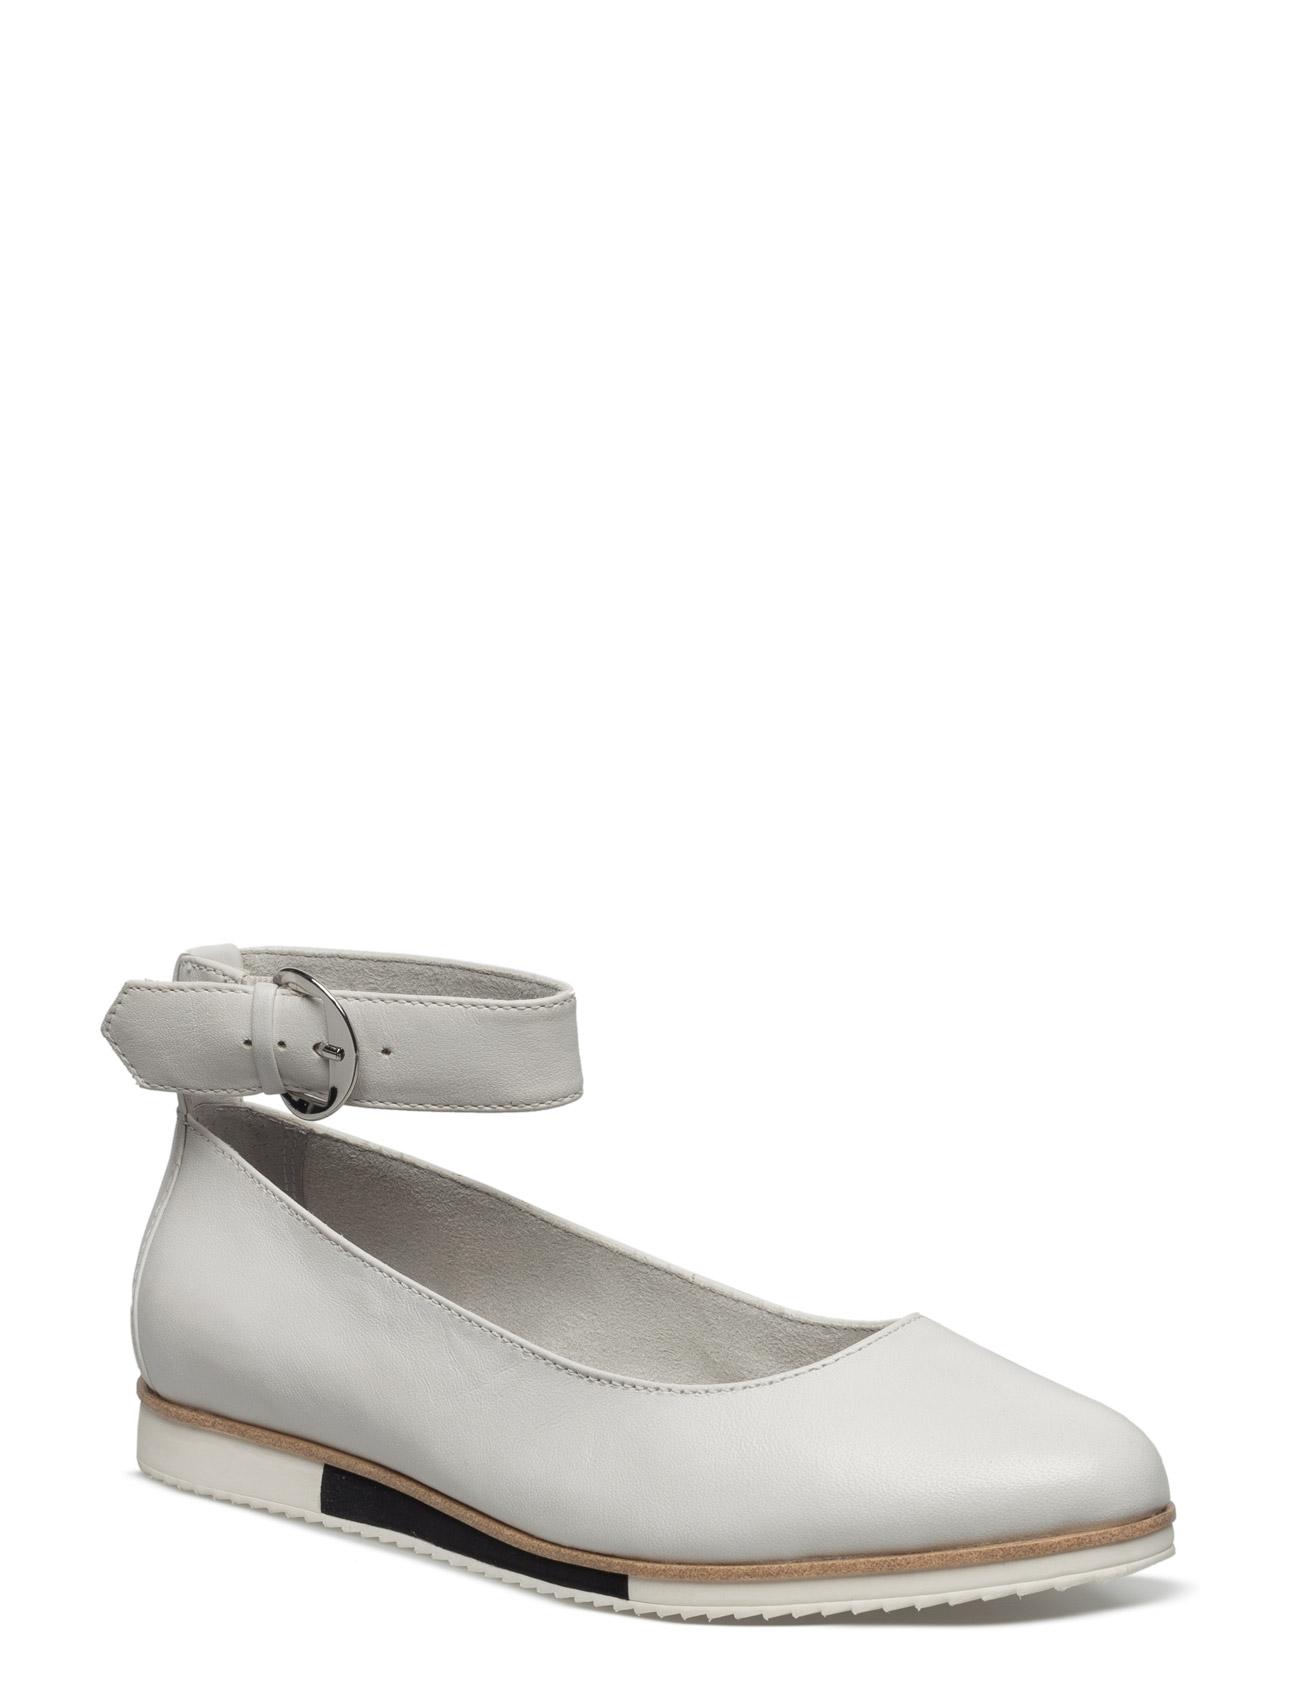 7df0c4f6e4b1 Bestil Woms Slip-On Tamaris Ballarinaer i hvid til Damer i en online  fashion store